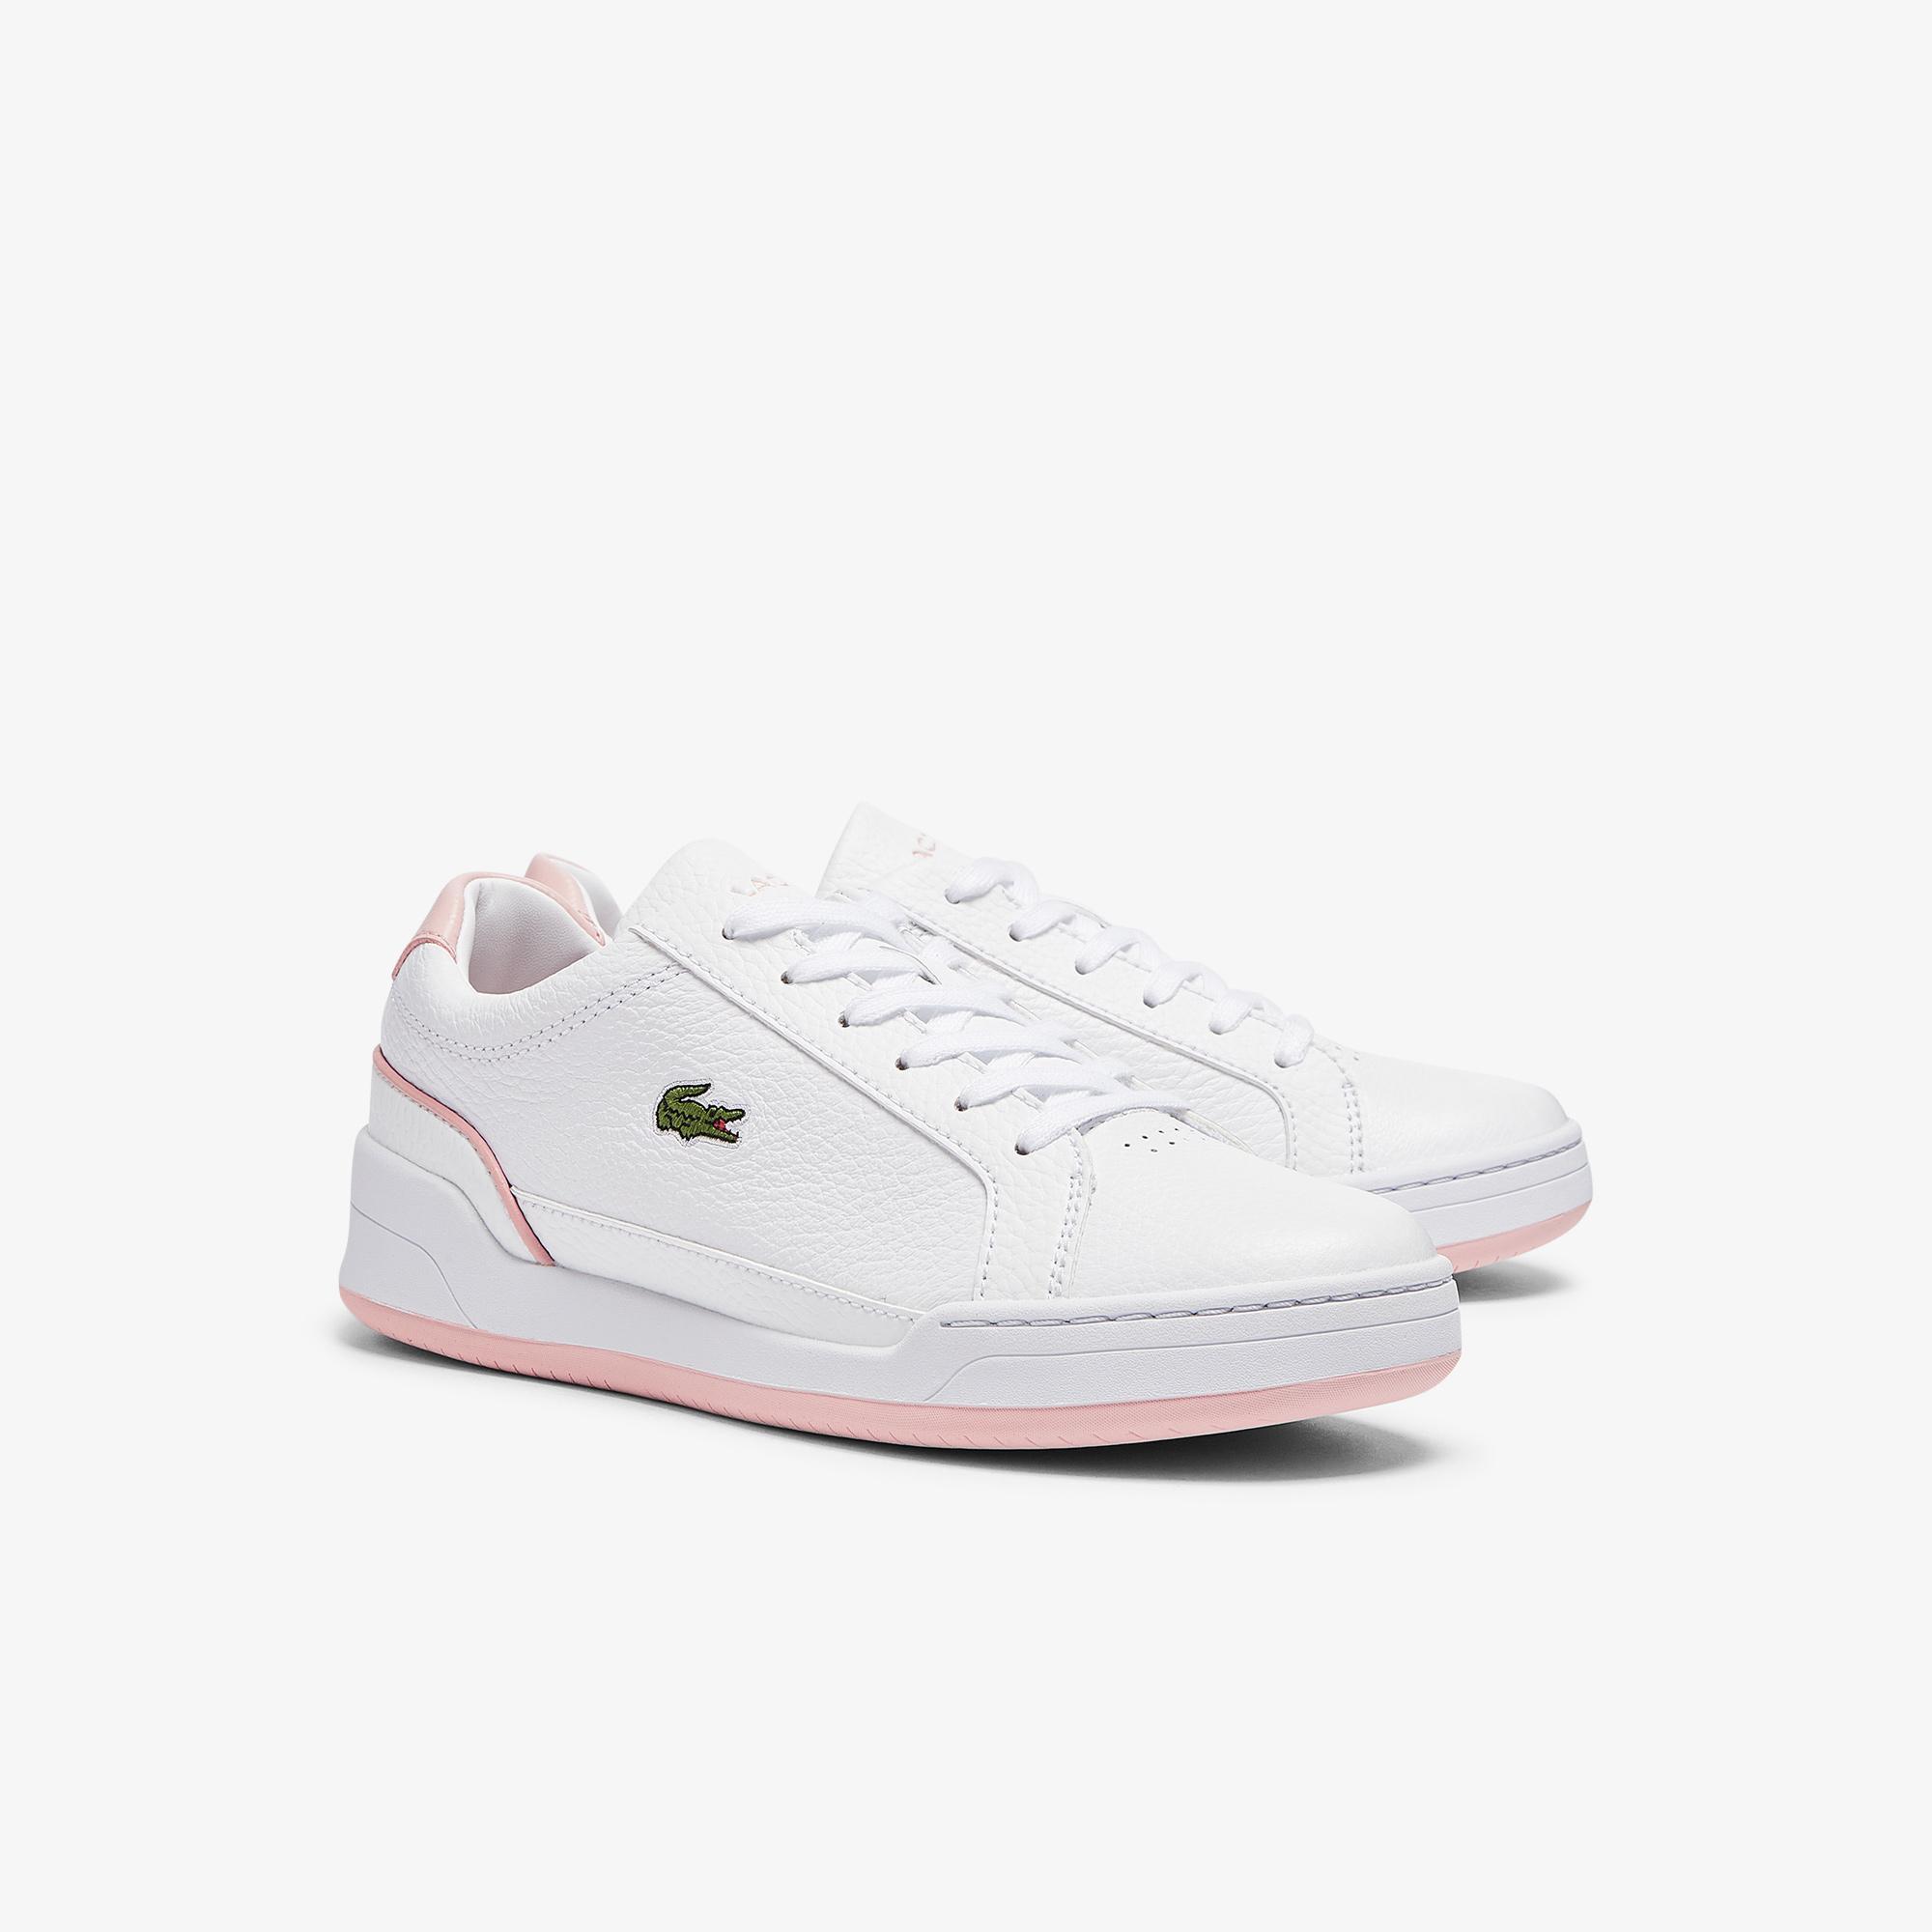 Lacoste Women'S Challenge 0721 1 Sfa Shoes